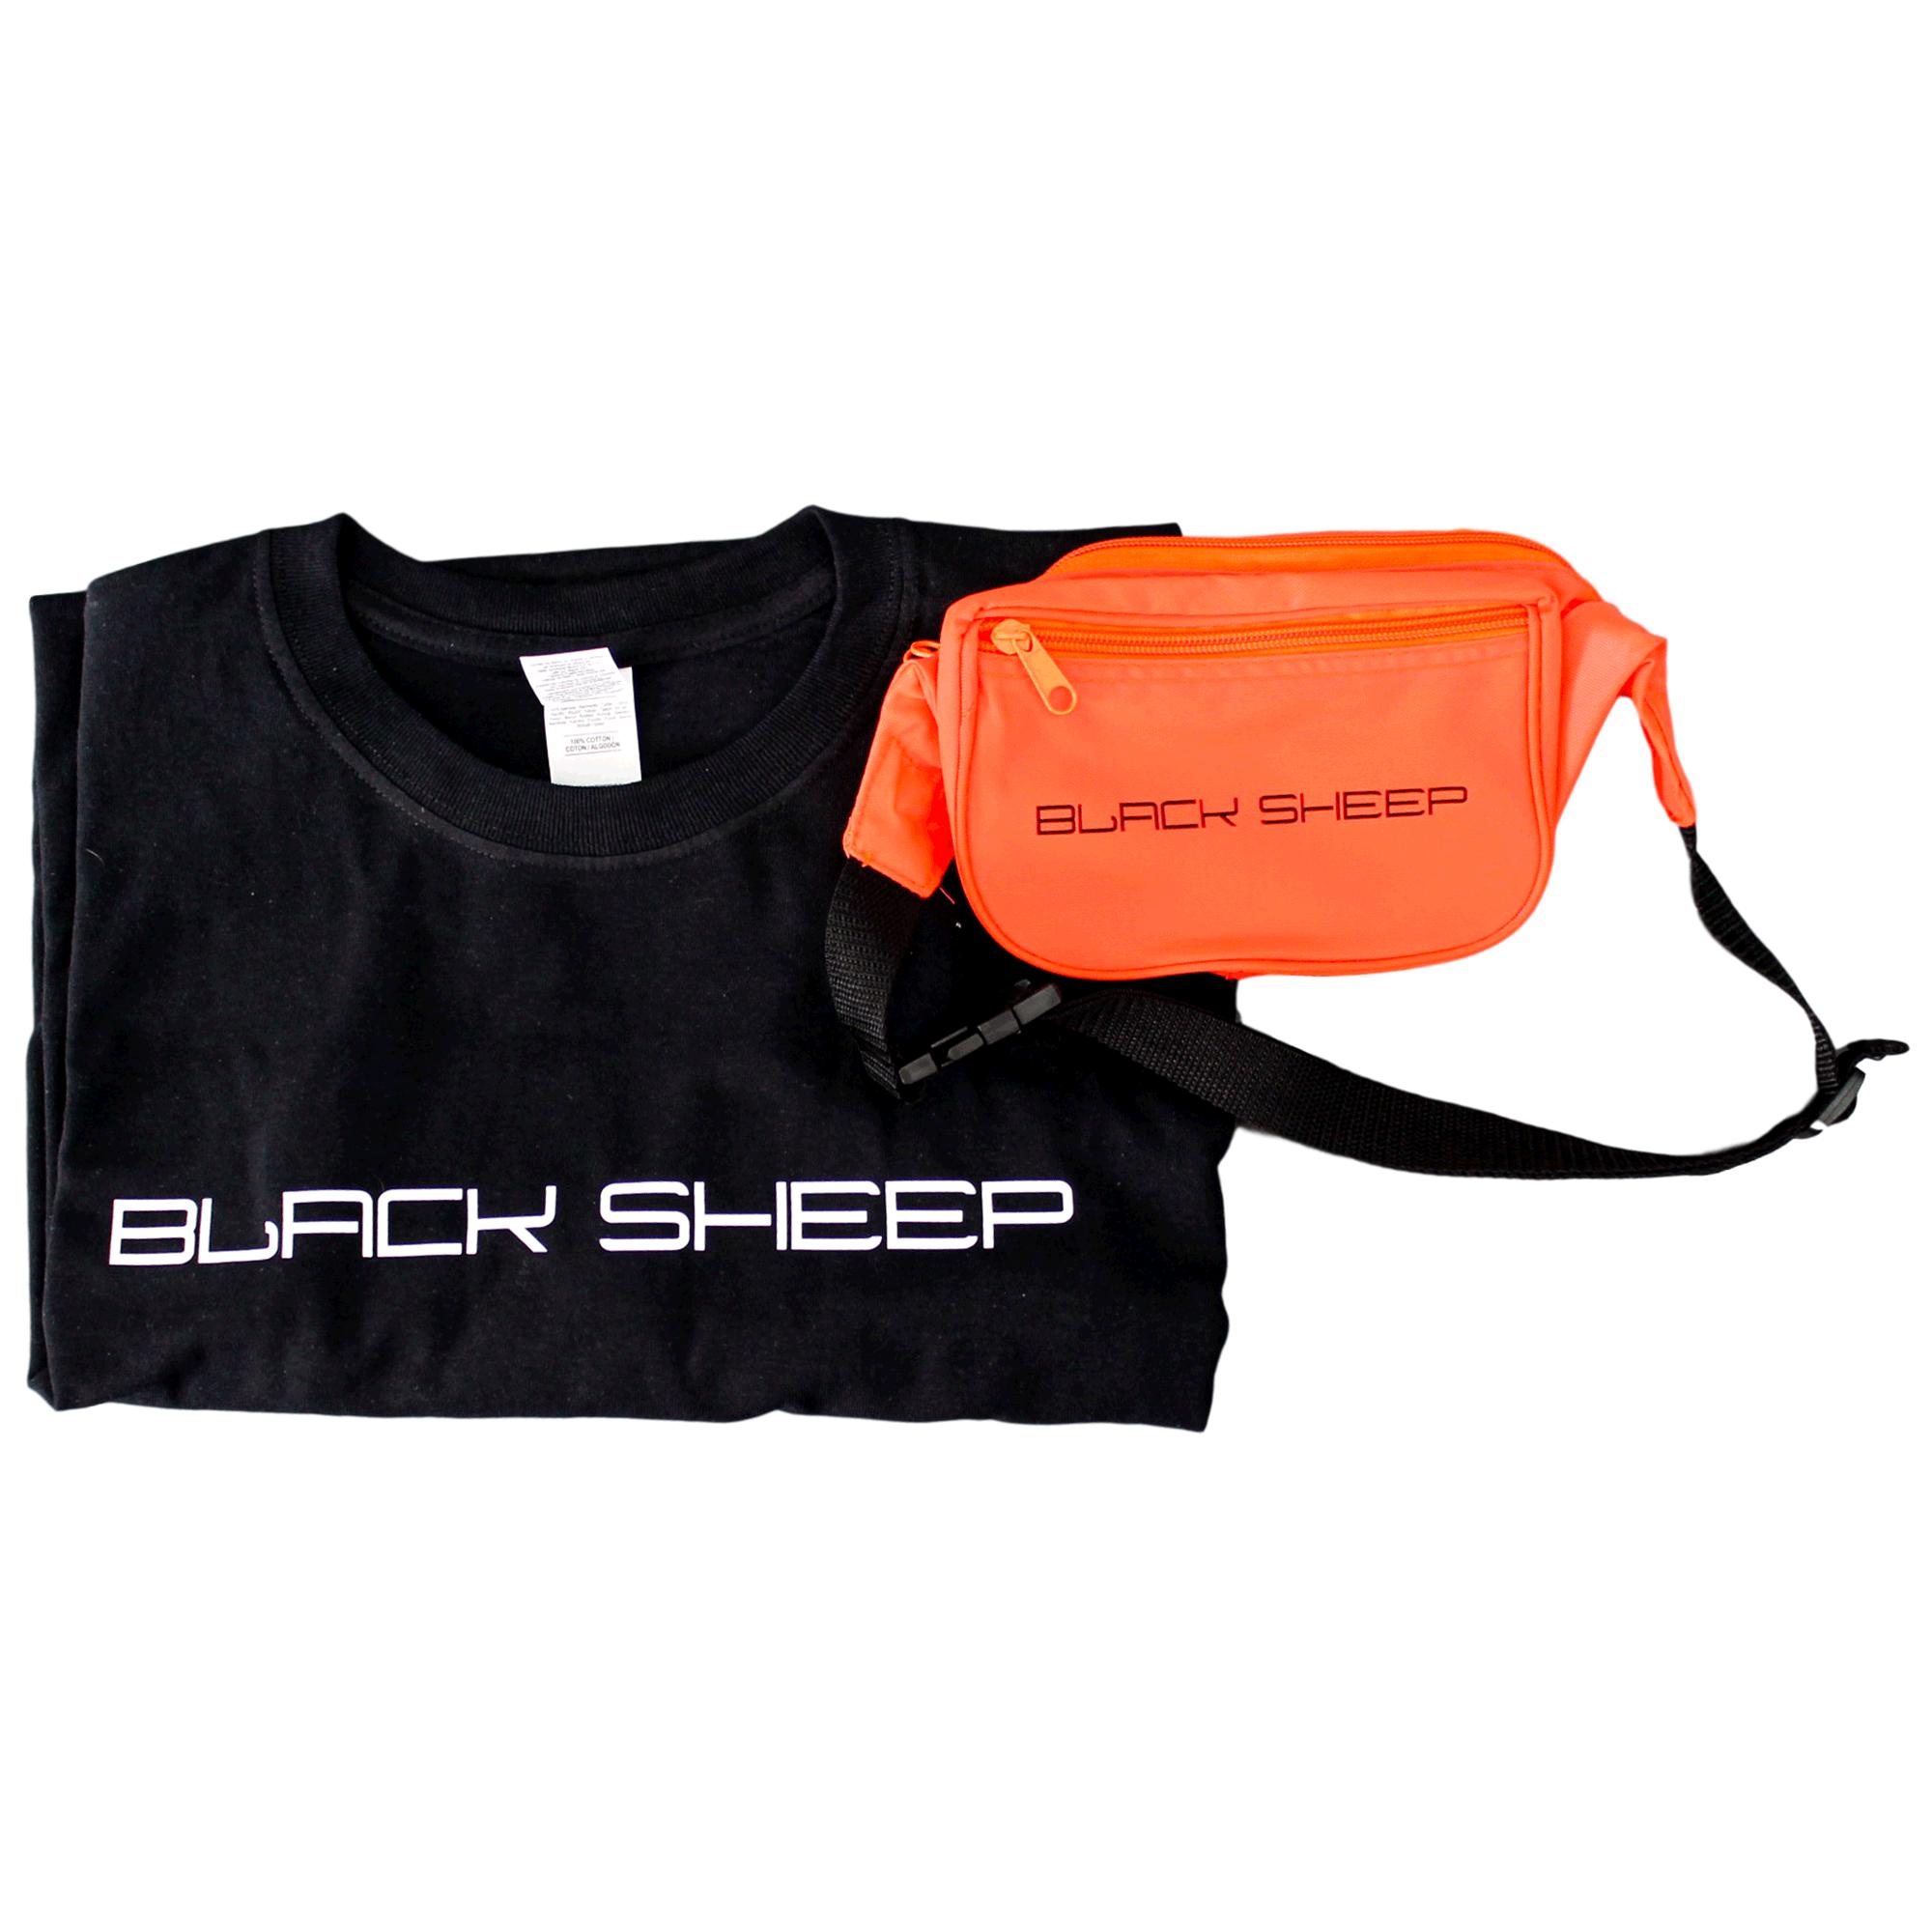 black-sheep-orange-fanny-and-shirt.png